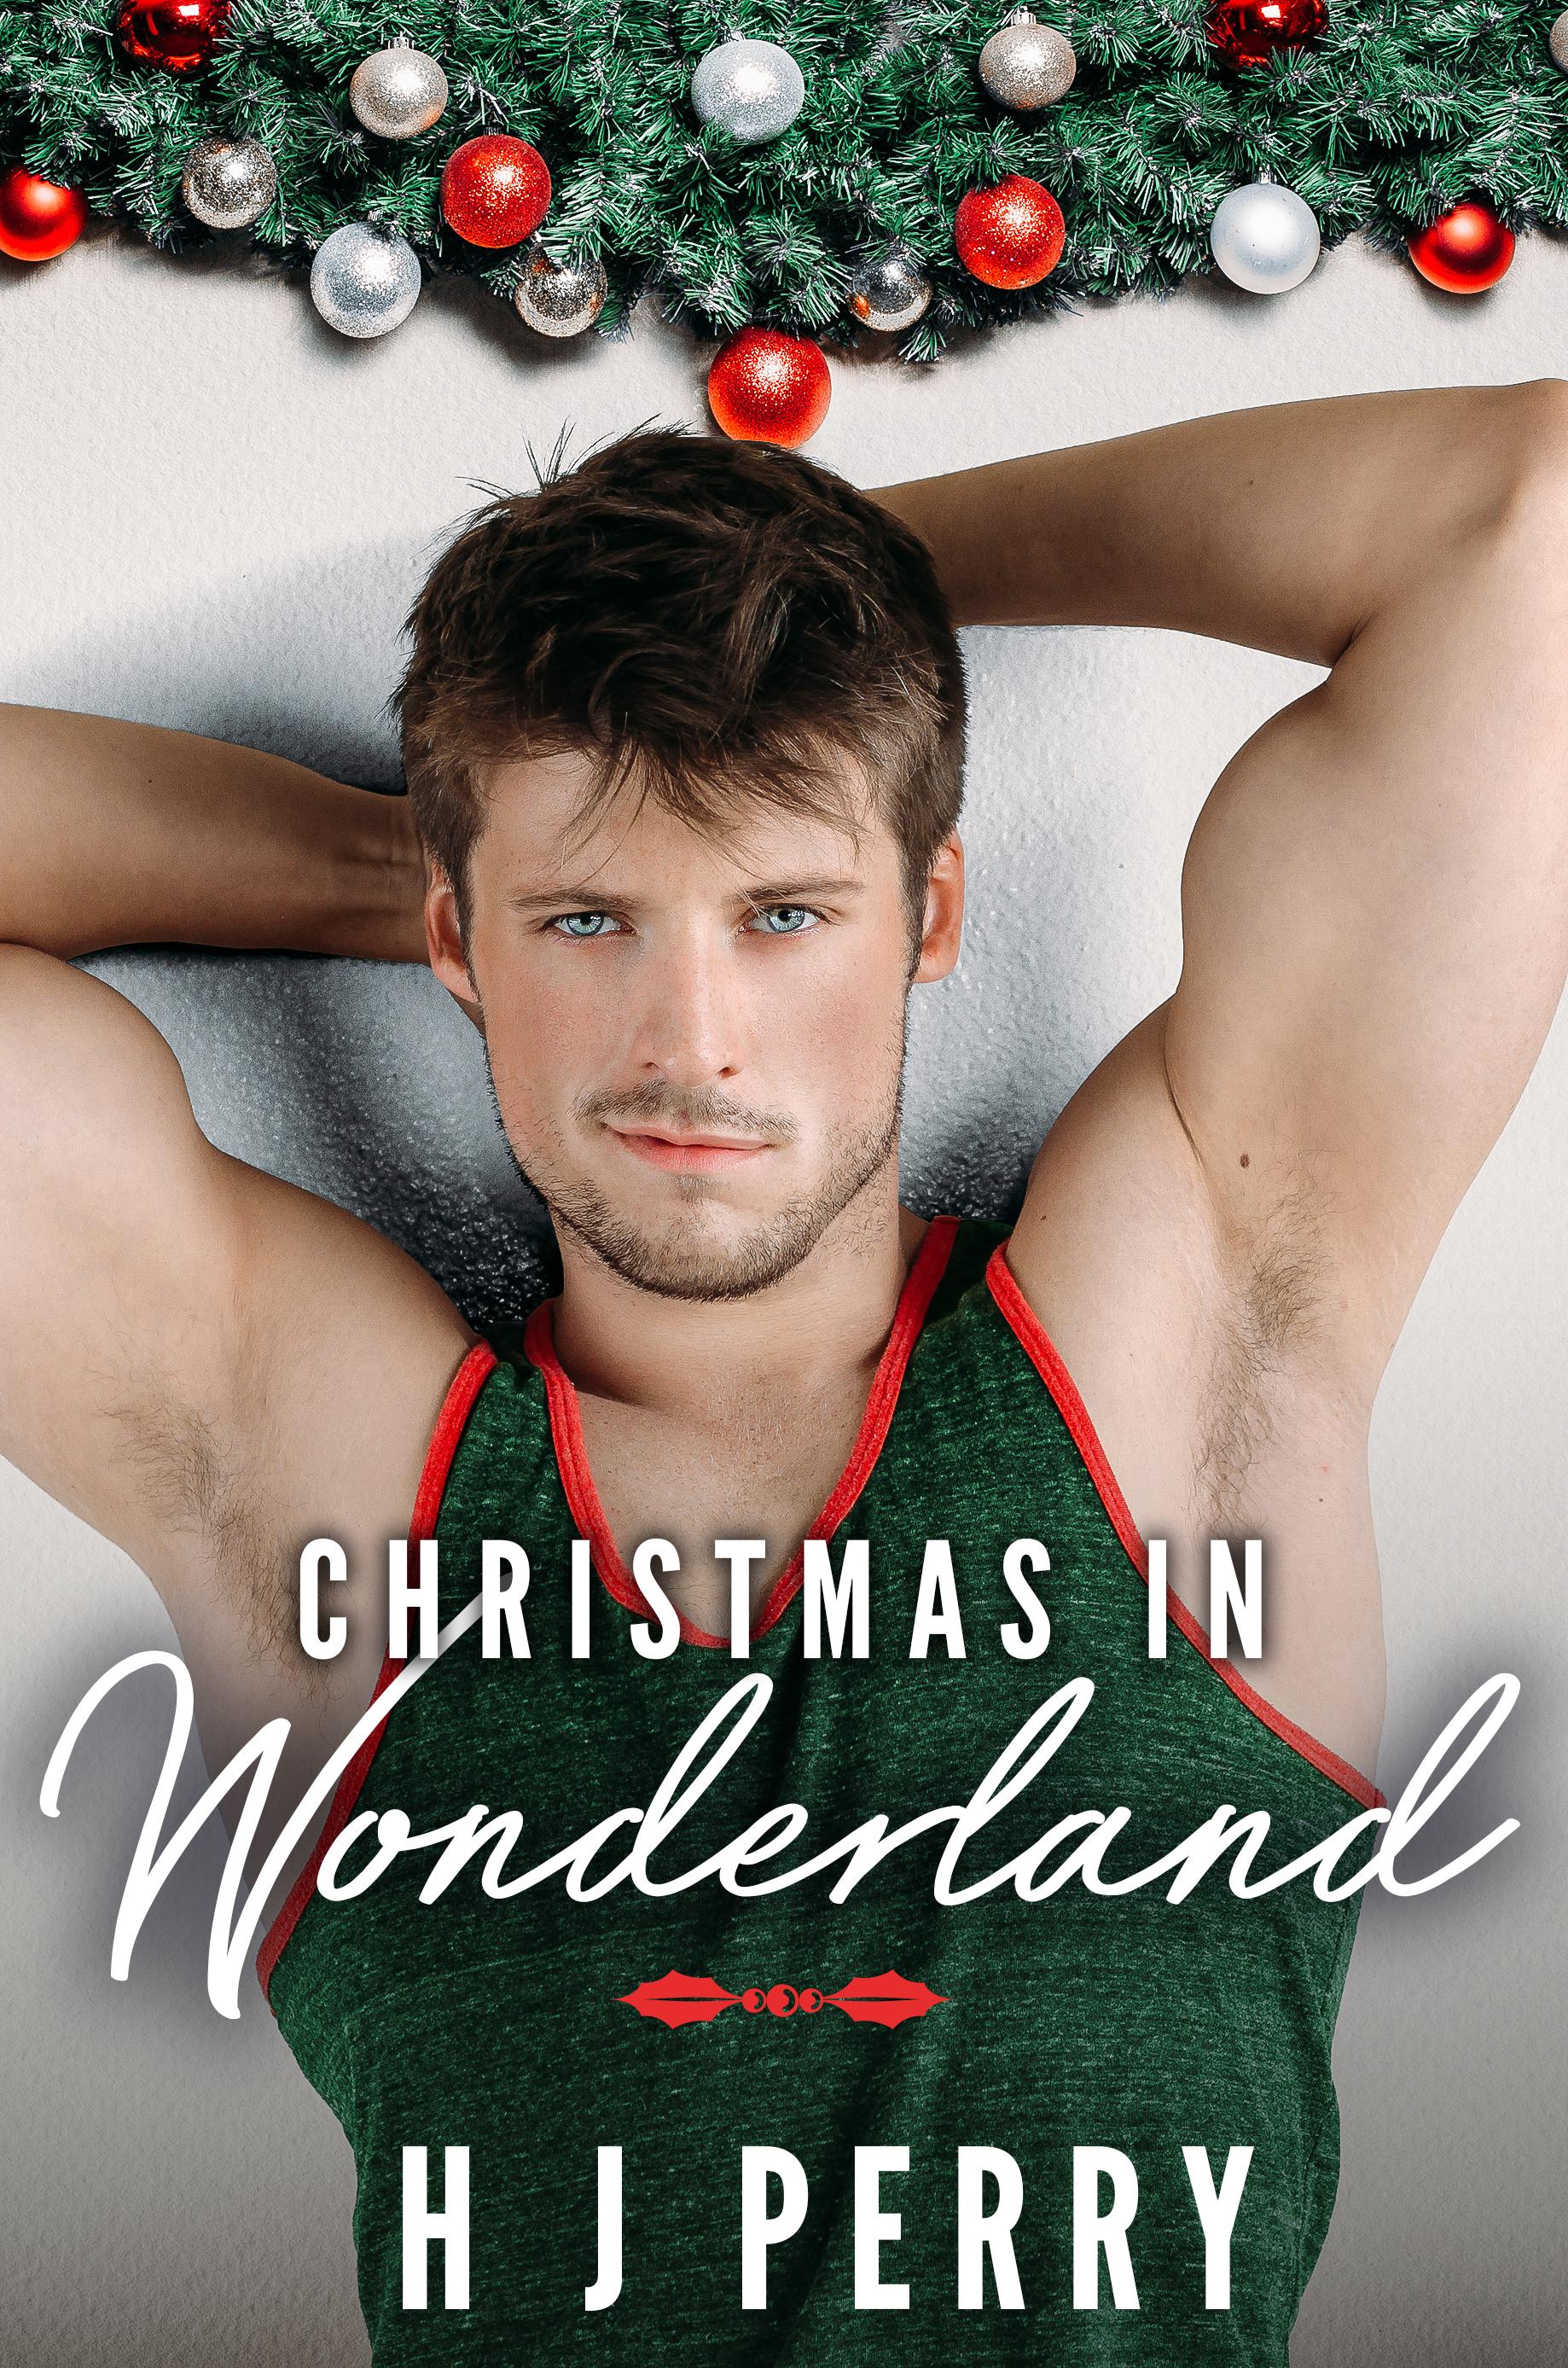 Christmas In Wonderland.Smashwords Christmas In Wonderland A Book By Helen J Perry